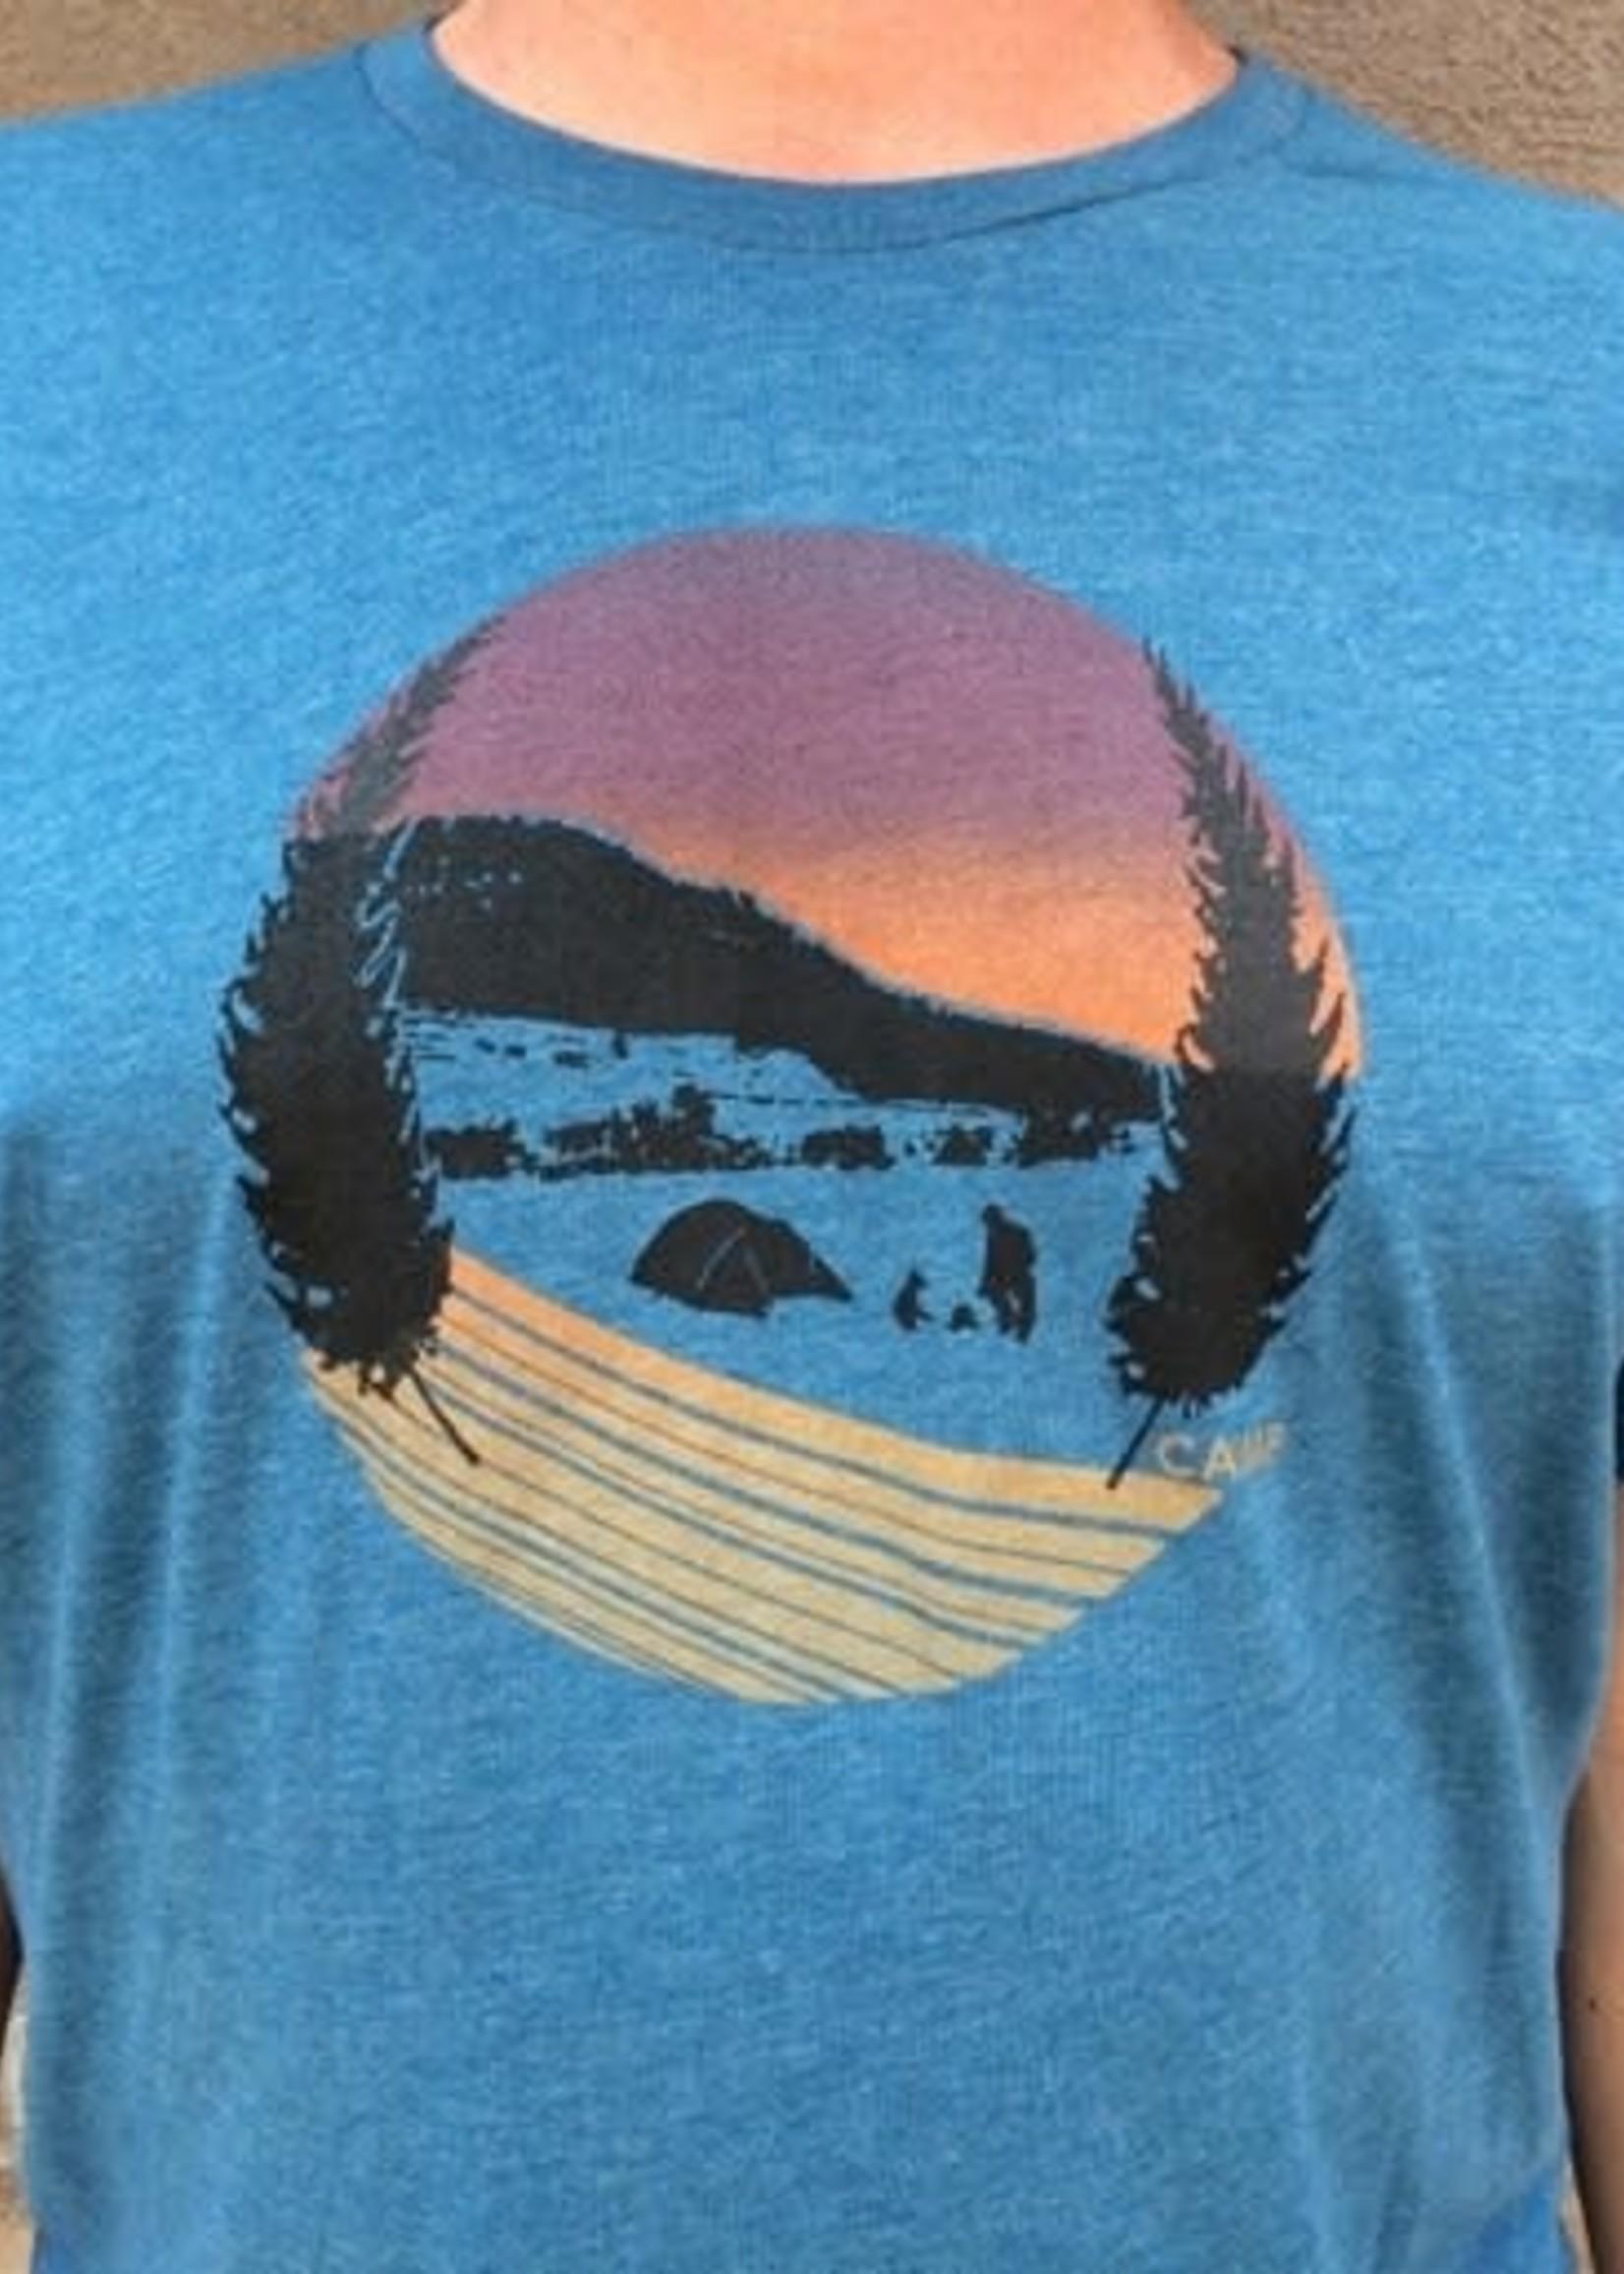 Camp Adult T-Shirt